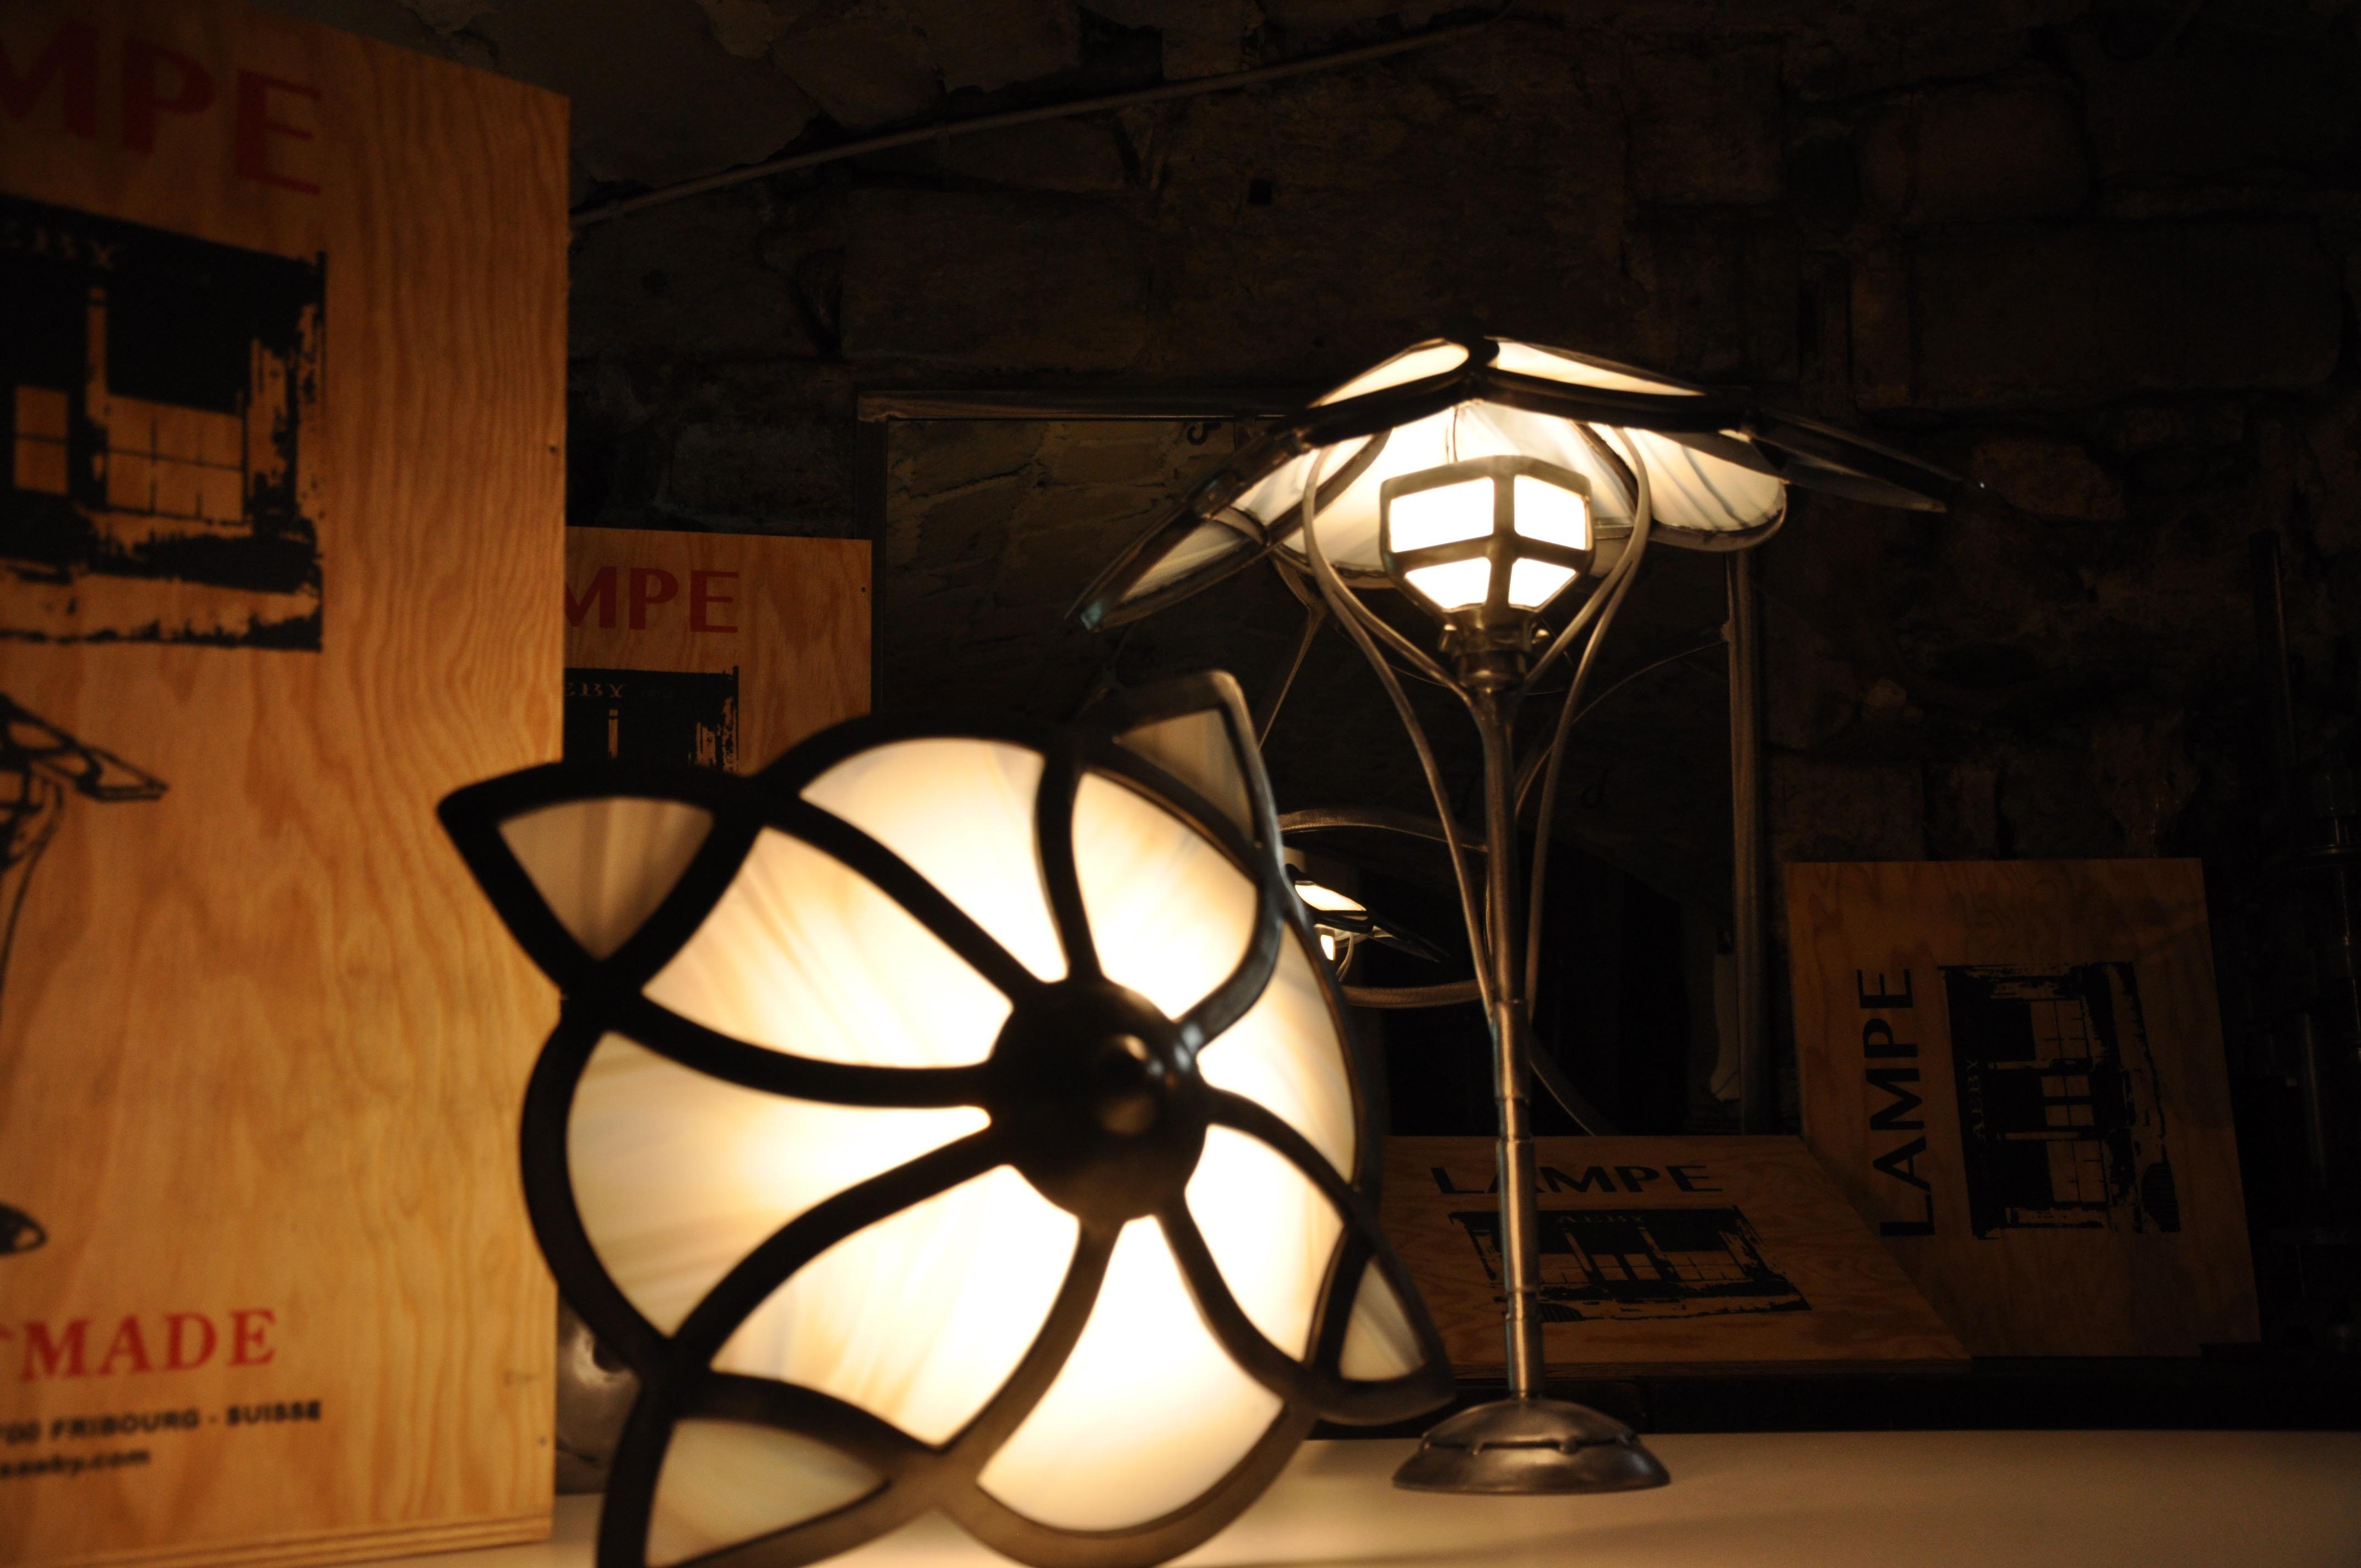 Lampe Chaos